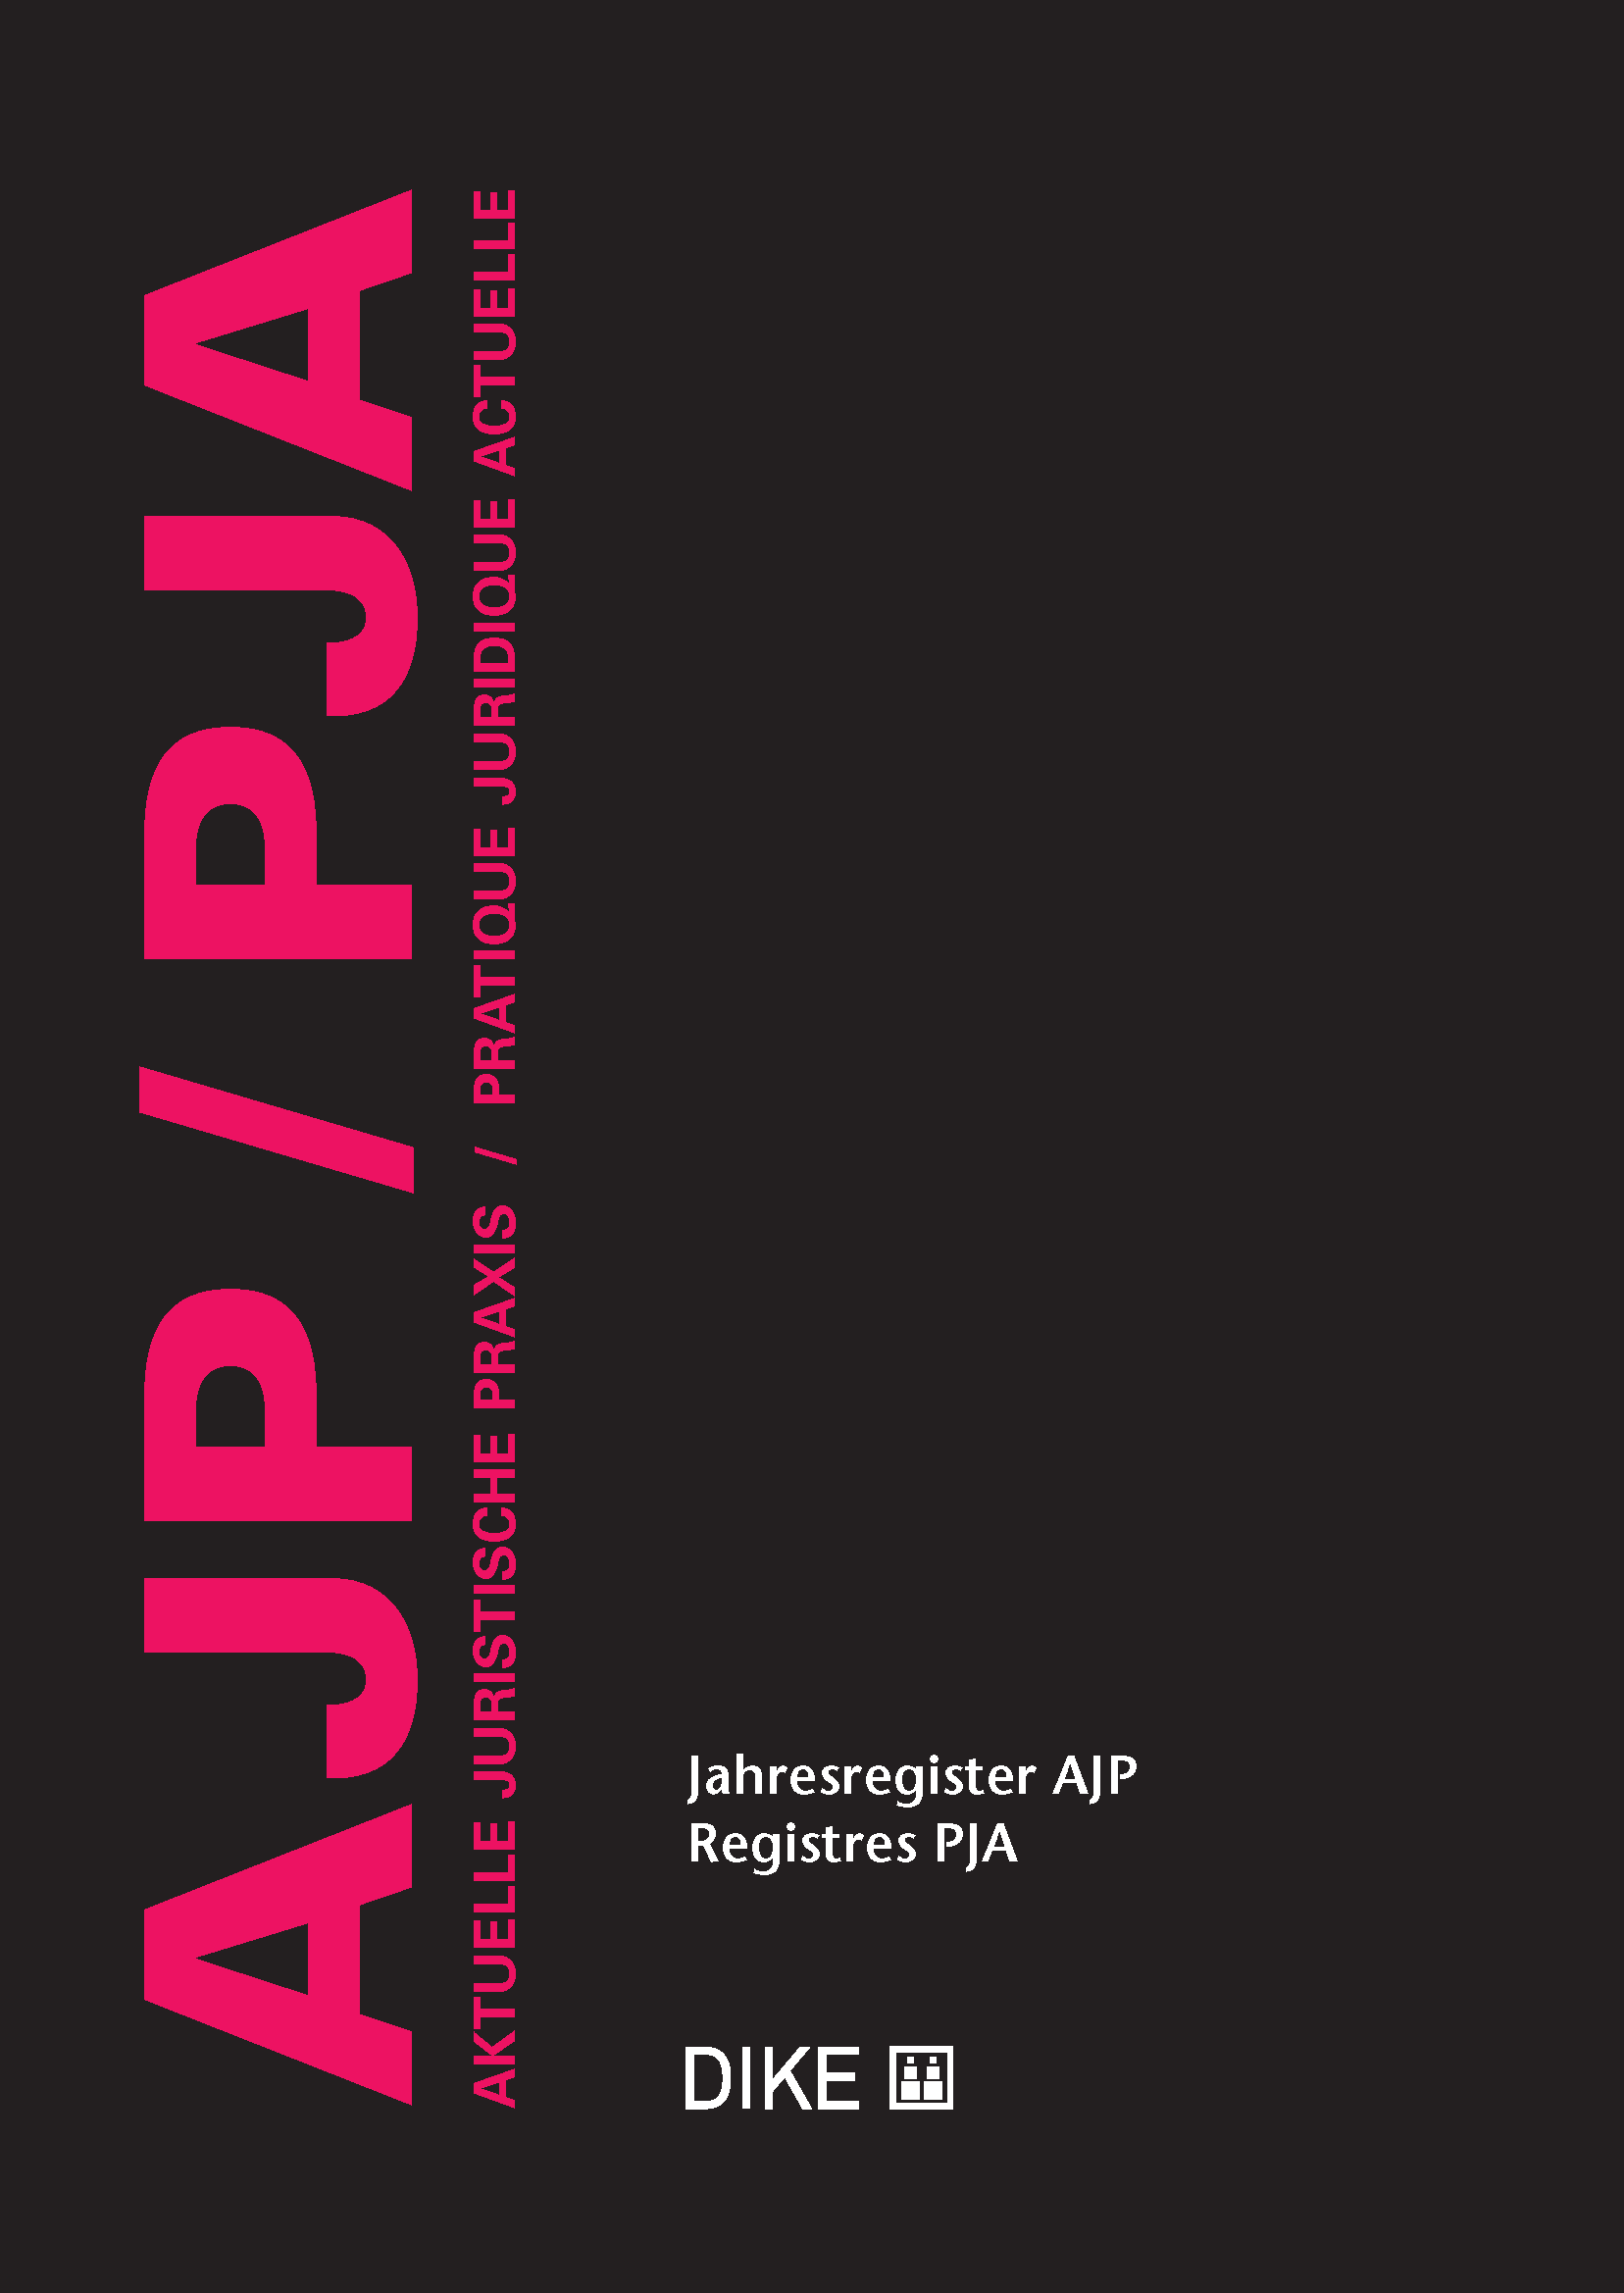 Accessories AJP/PJA Jahresregister